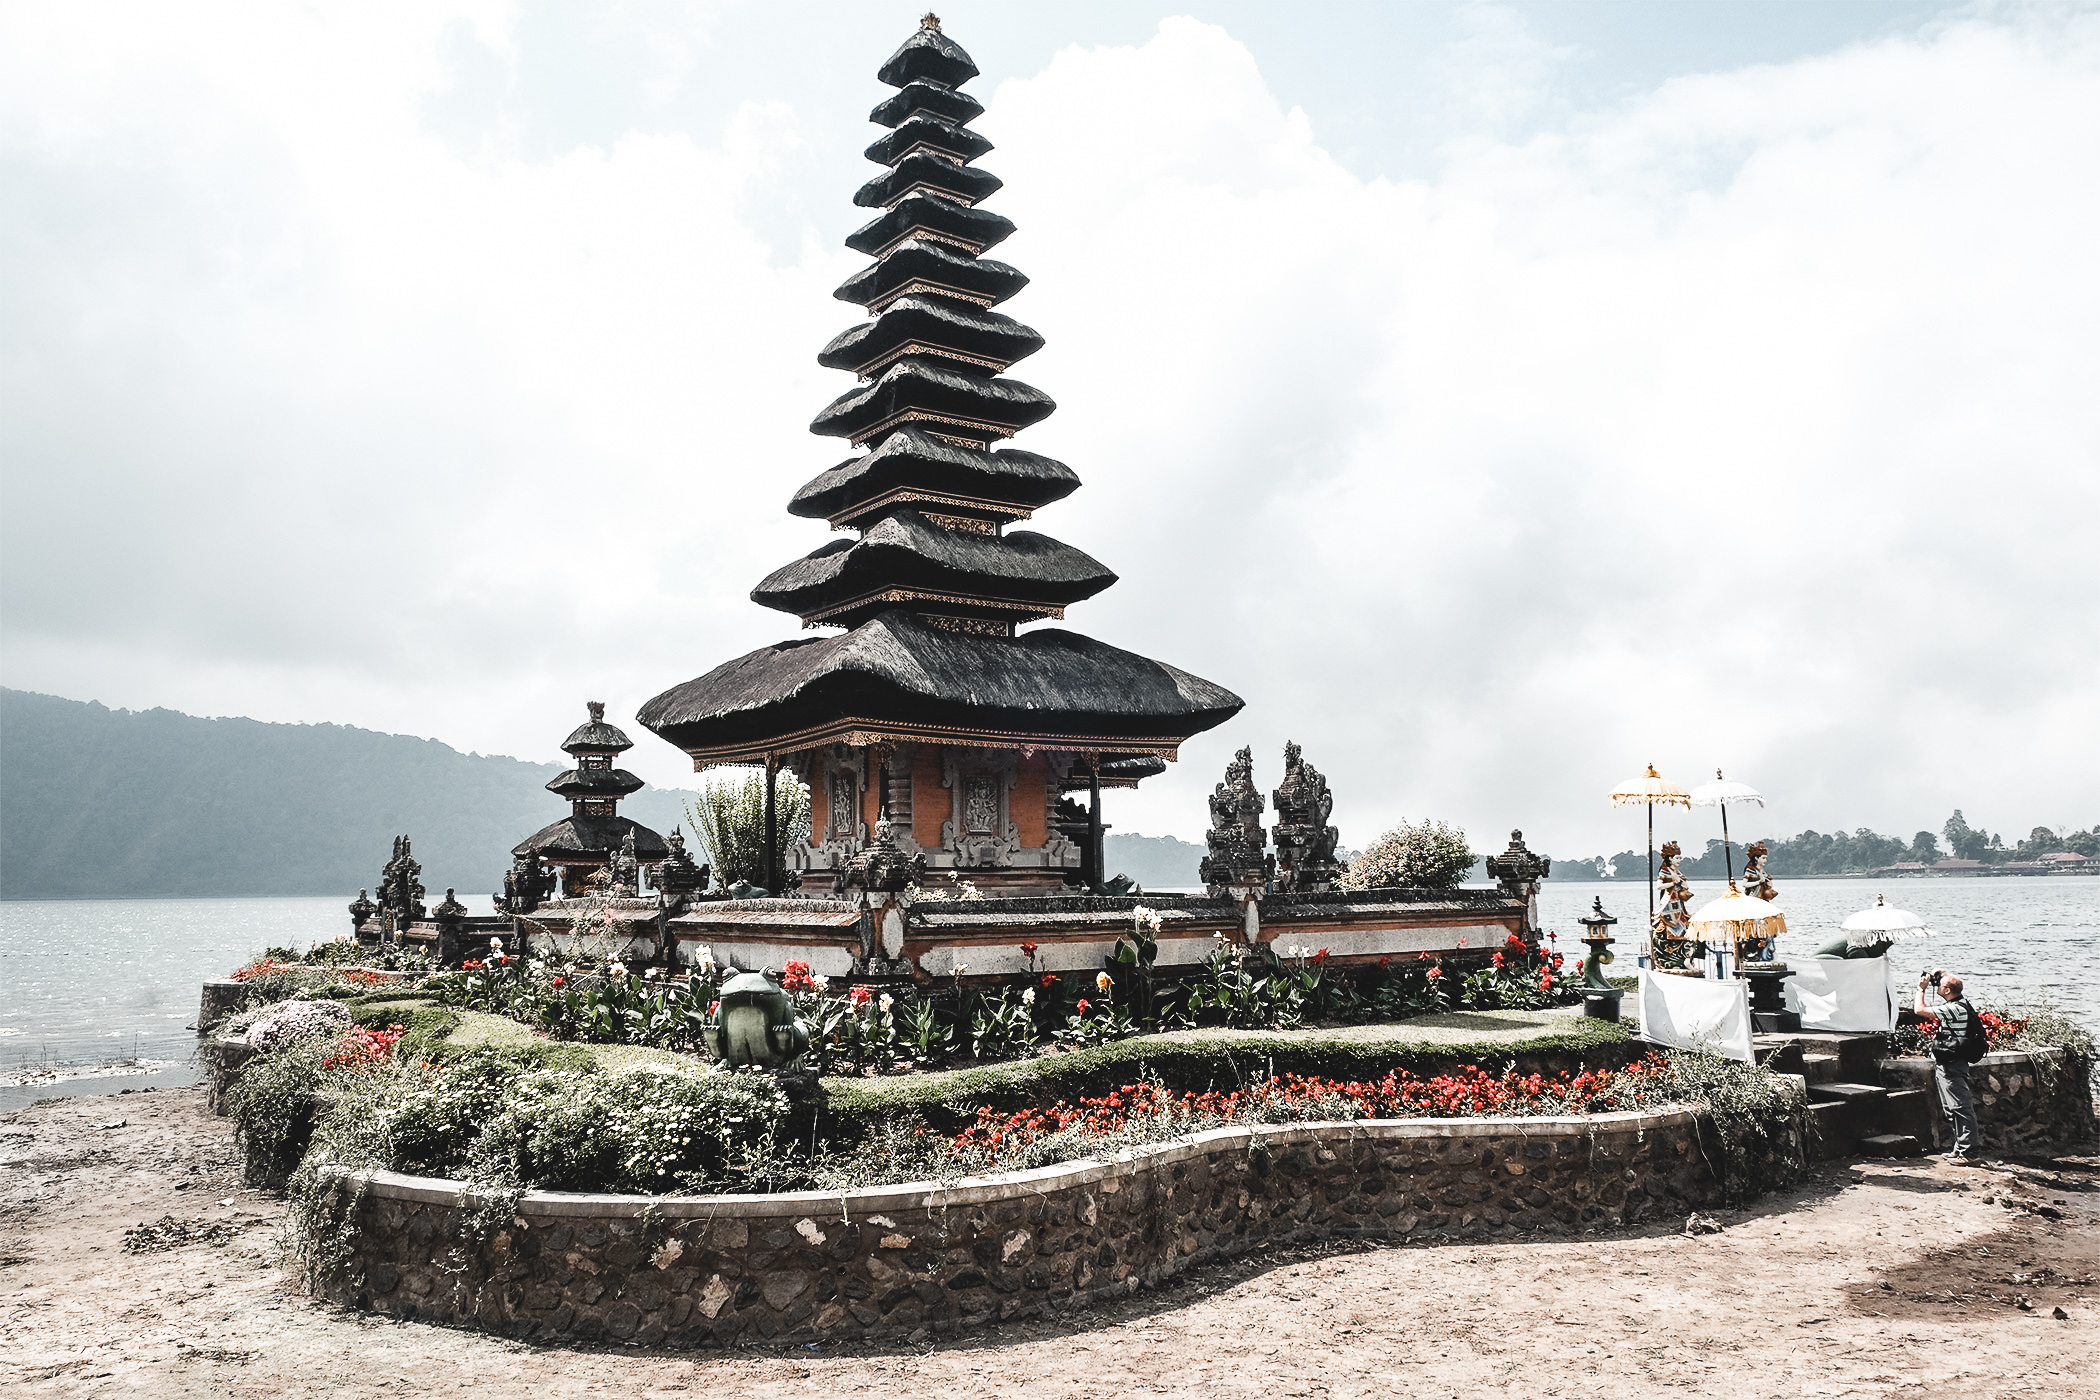 Travel blogger vibes, girl visiting Bali. Pura Ulun Danu Bratan or Pura Bratan . Ubud Indonesia. Bali travel.